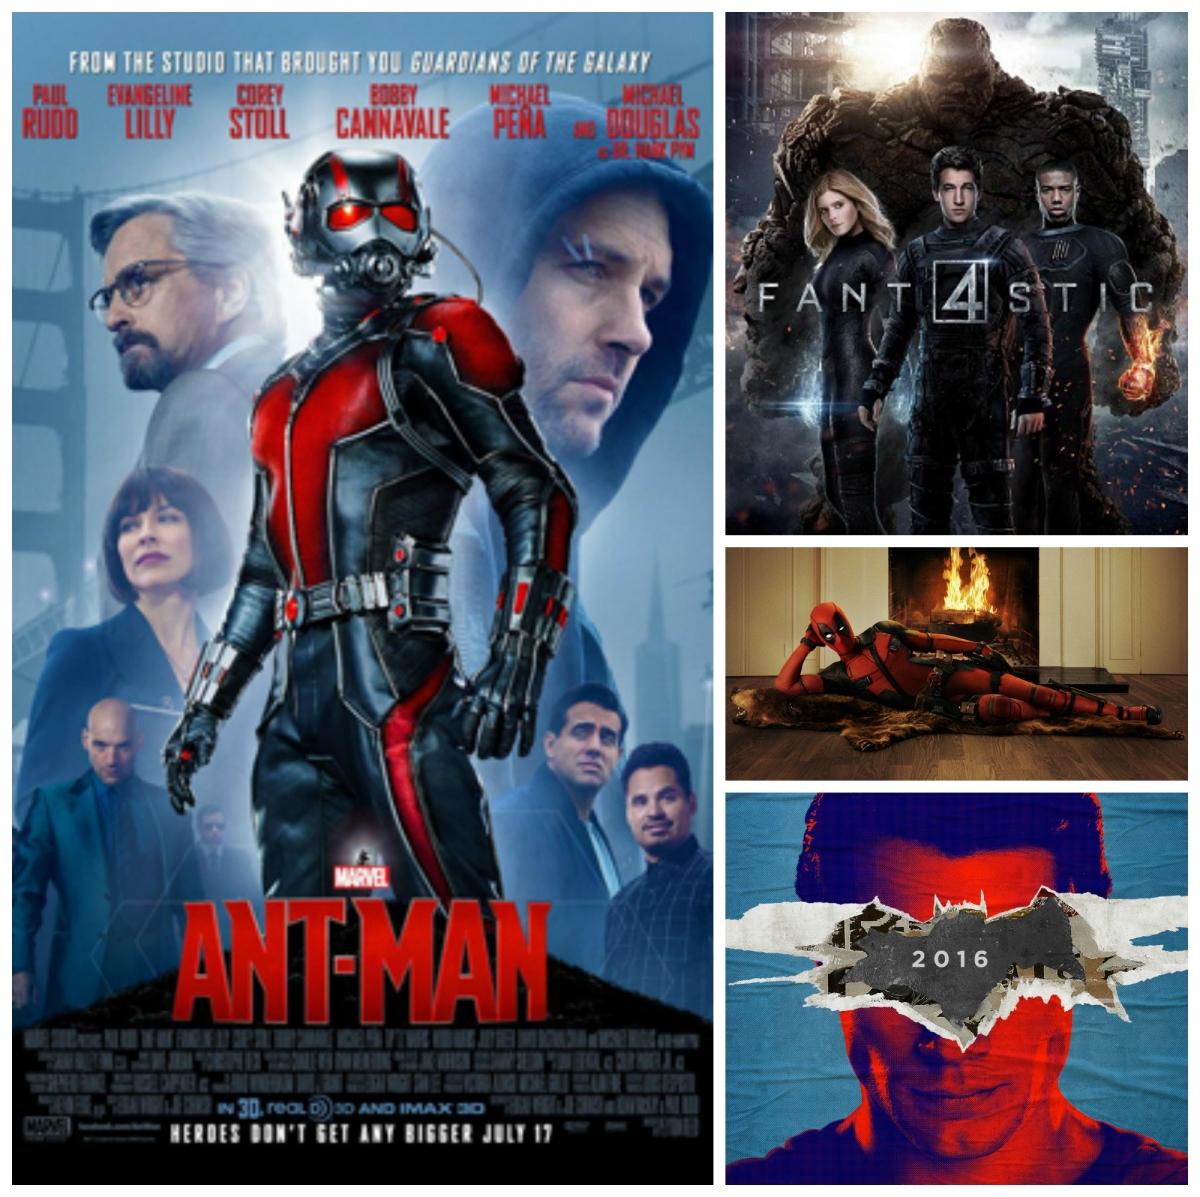 Movies: 'Ant-Man', 'Doctor Strange', Other Upcoming Superhero